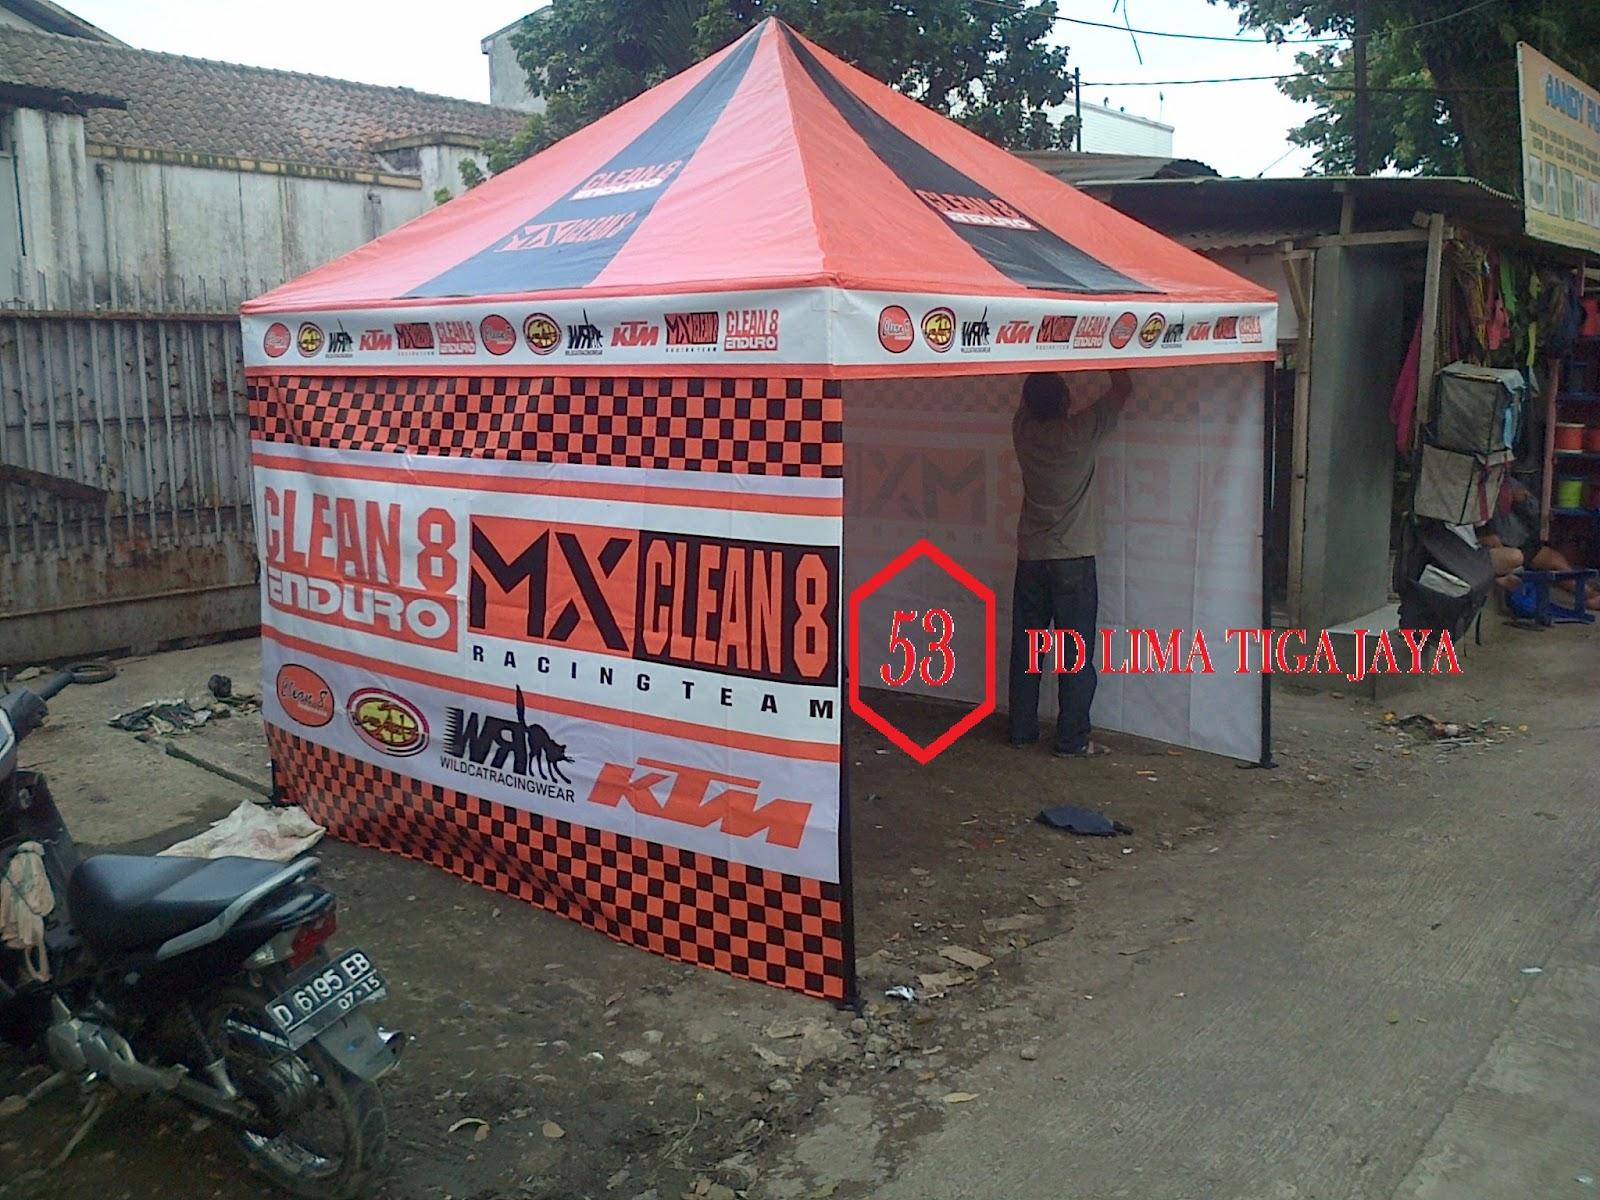 jual tenda promosi gazebo tenda cafe murah bandung